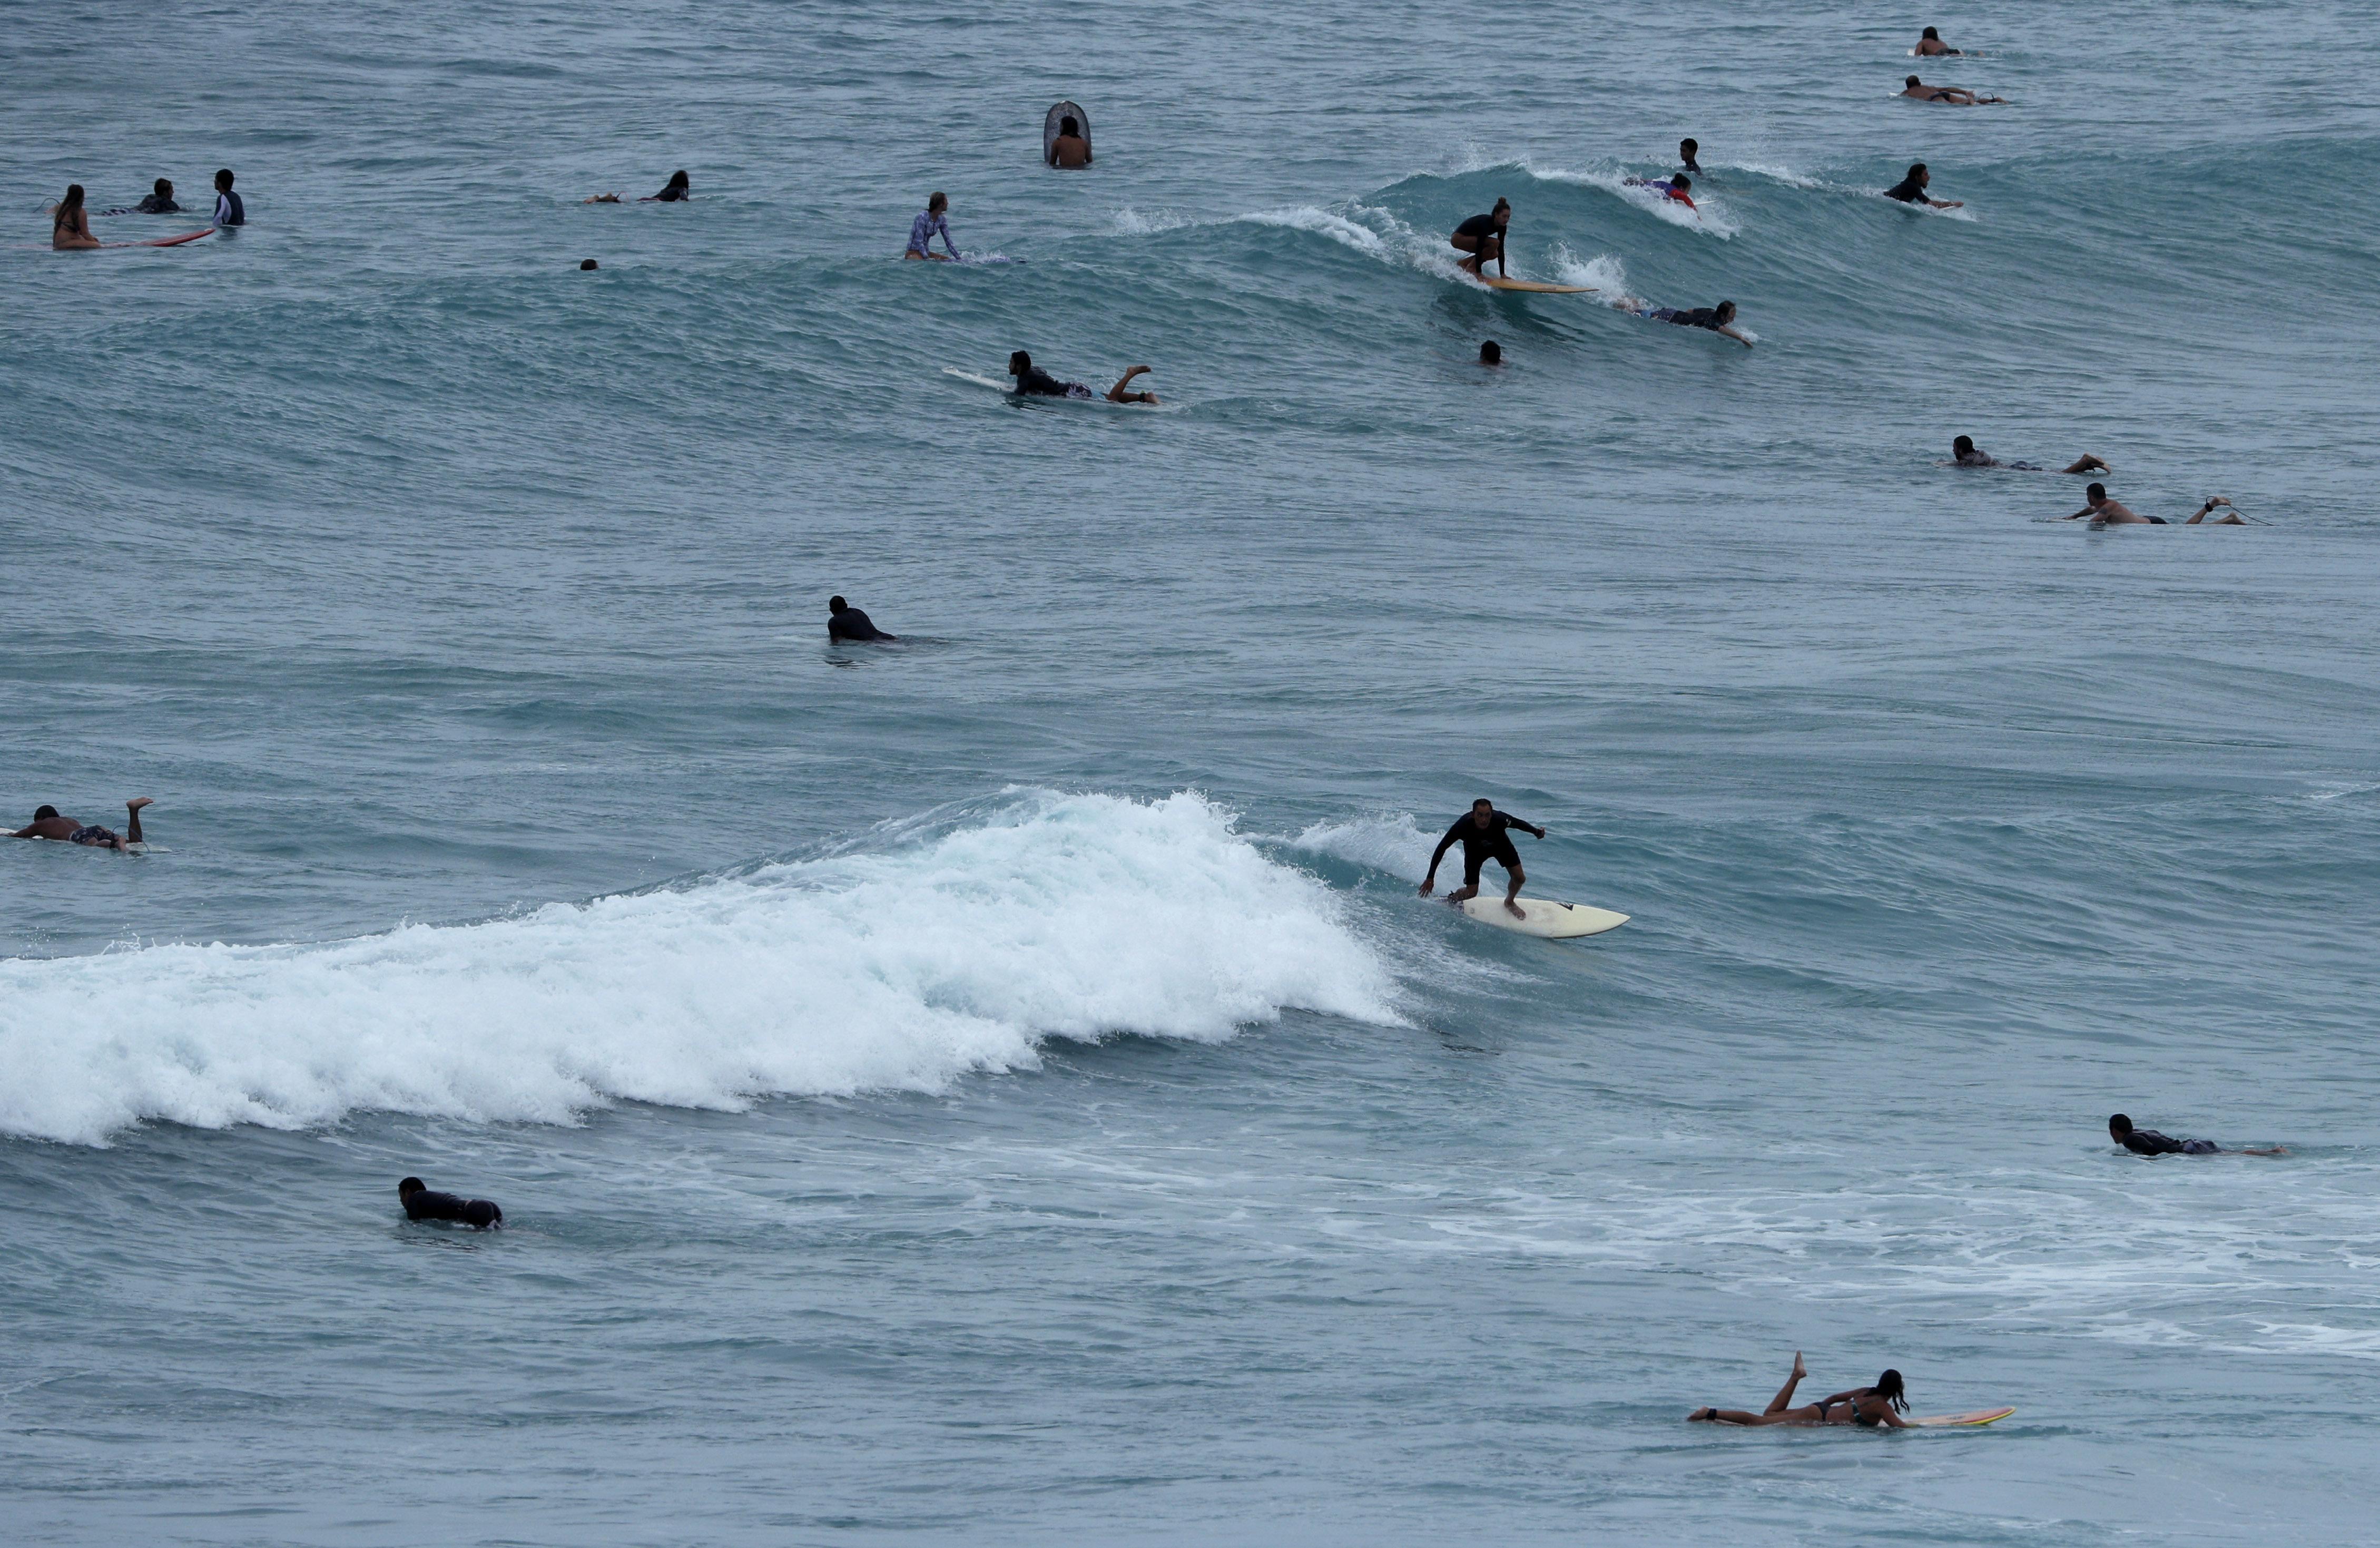 People Surf Off Waikiki Beach Ahead Of Hurricane Lane On Thursday Aug 23